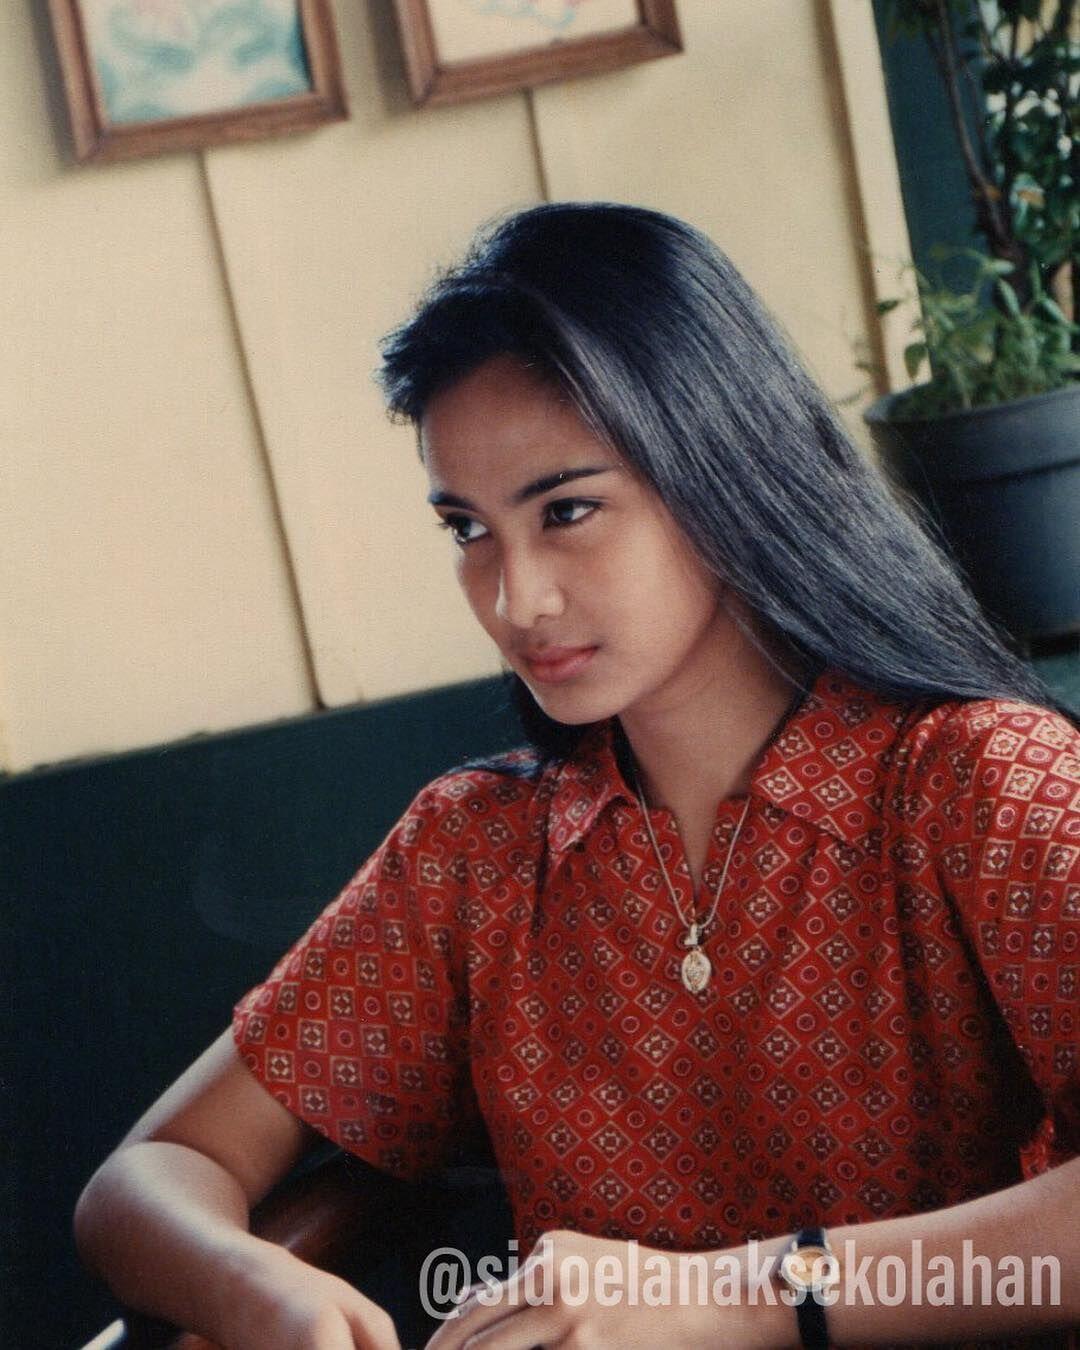 24 Tahun Berlalu, 10 Foto Bukti 'Zaenab' Tak Berubah Sama Sekali